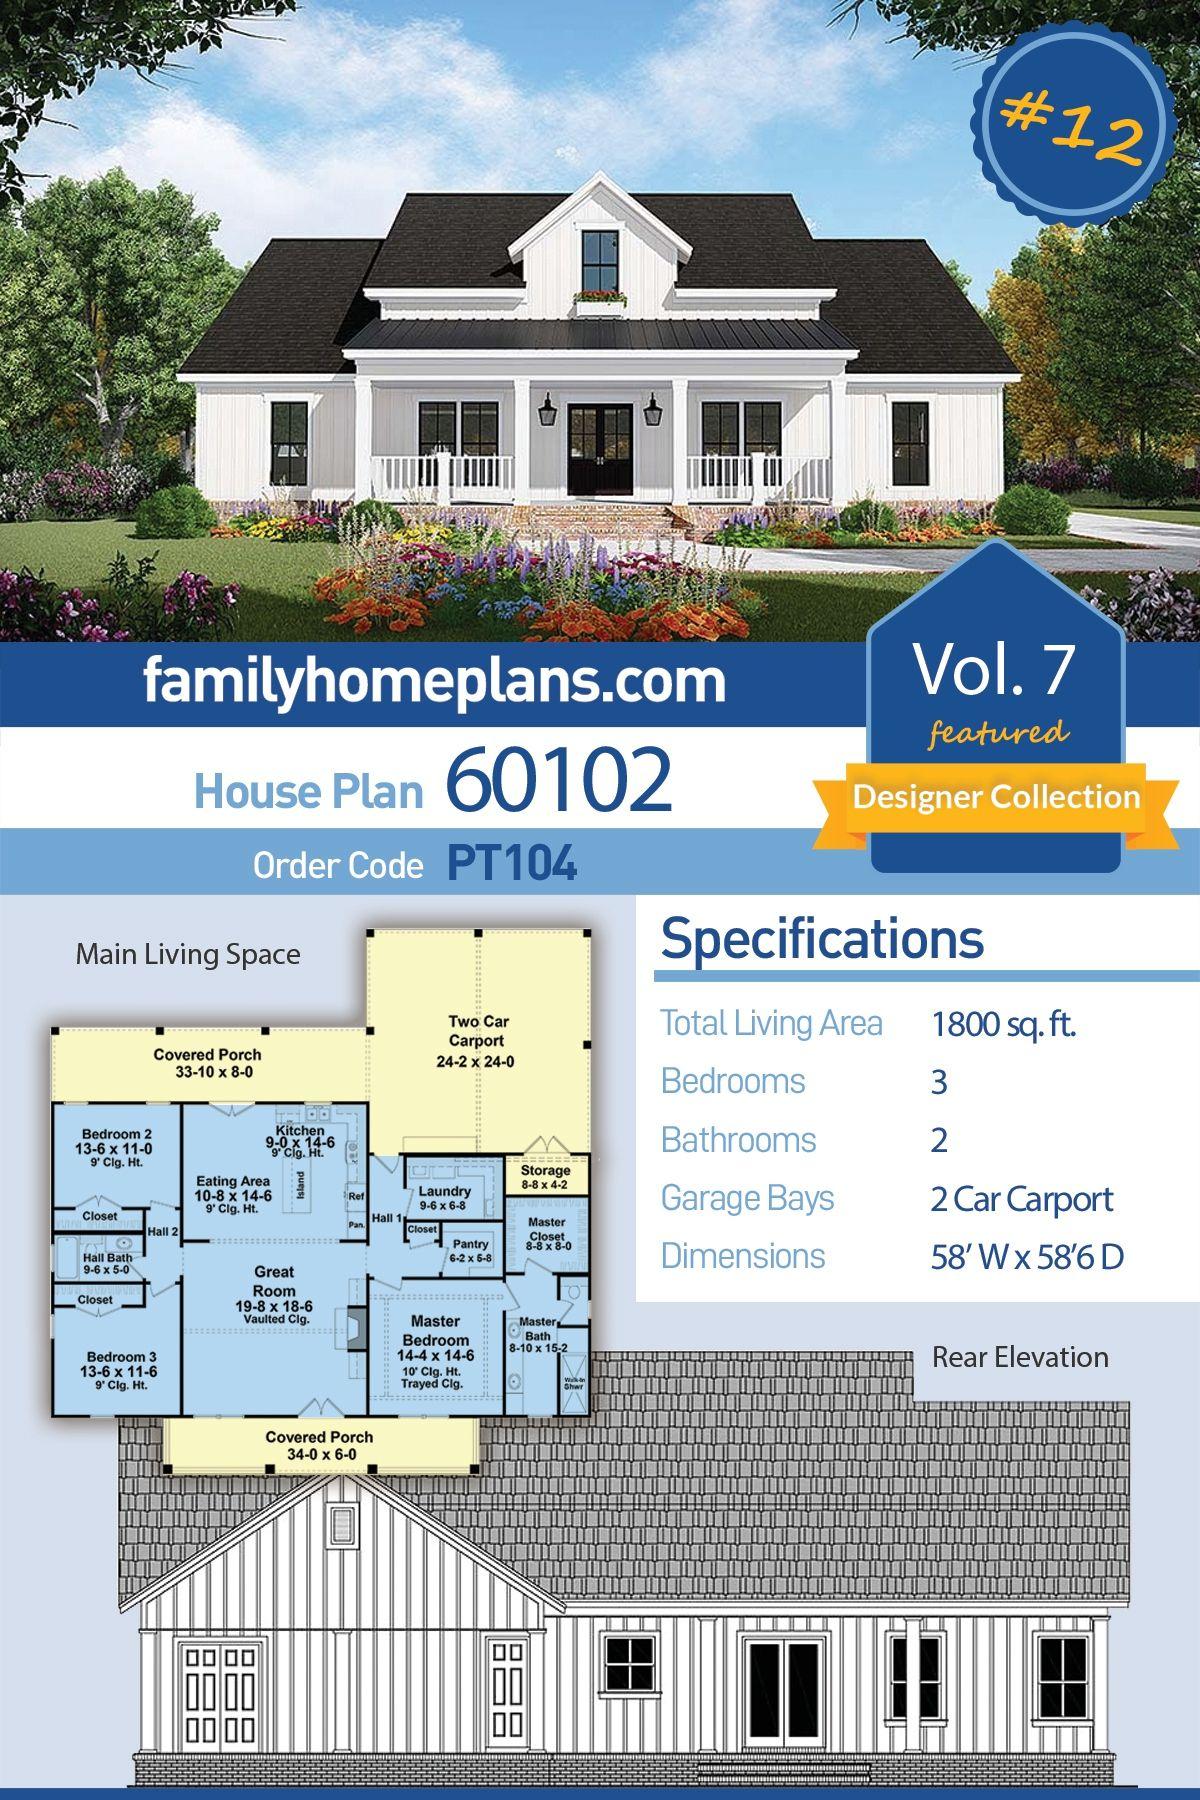 House Plan 60102 Country, Farmhouse, Southern House Plan